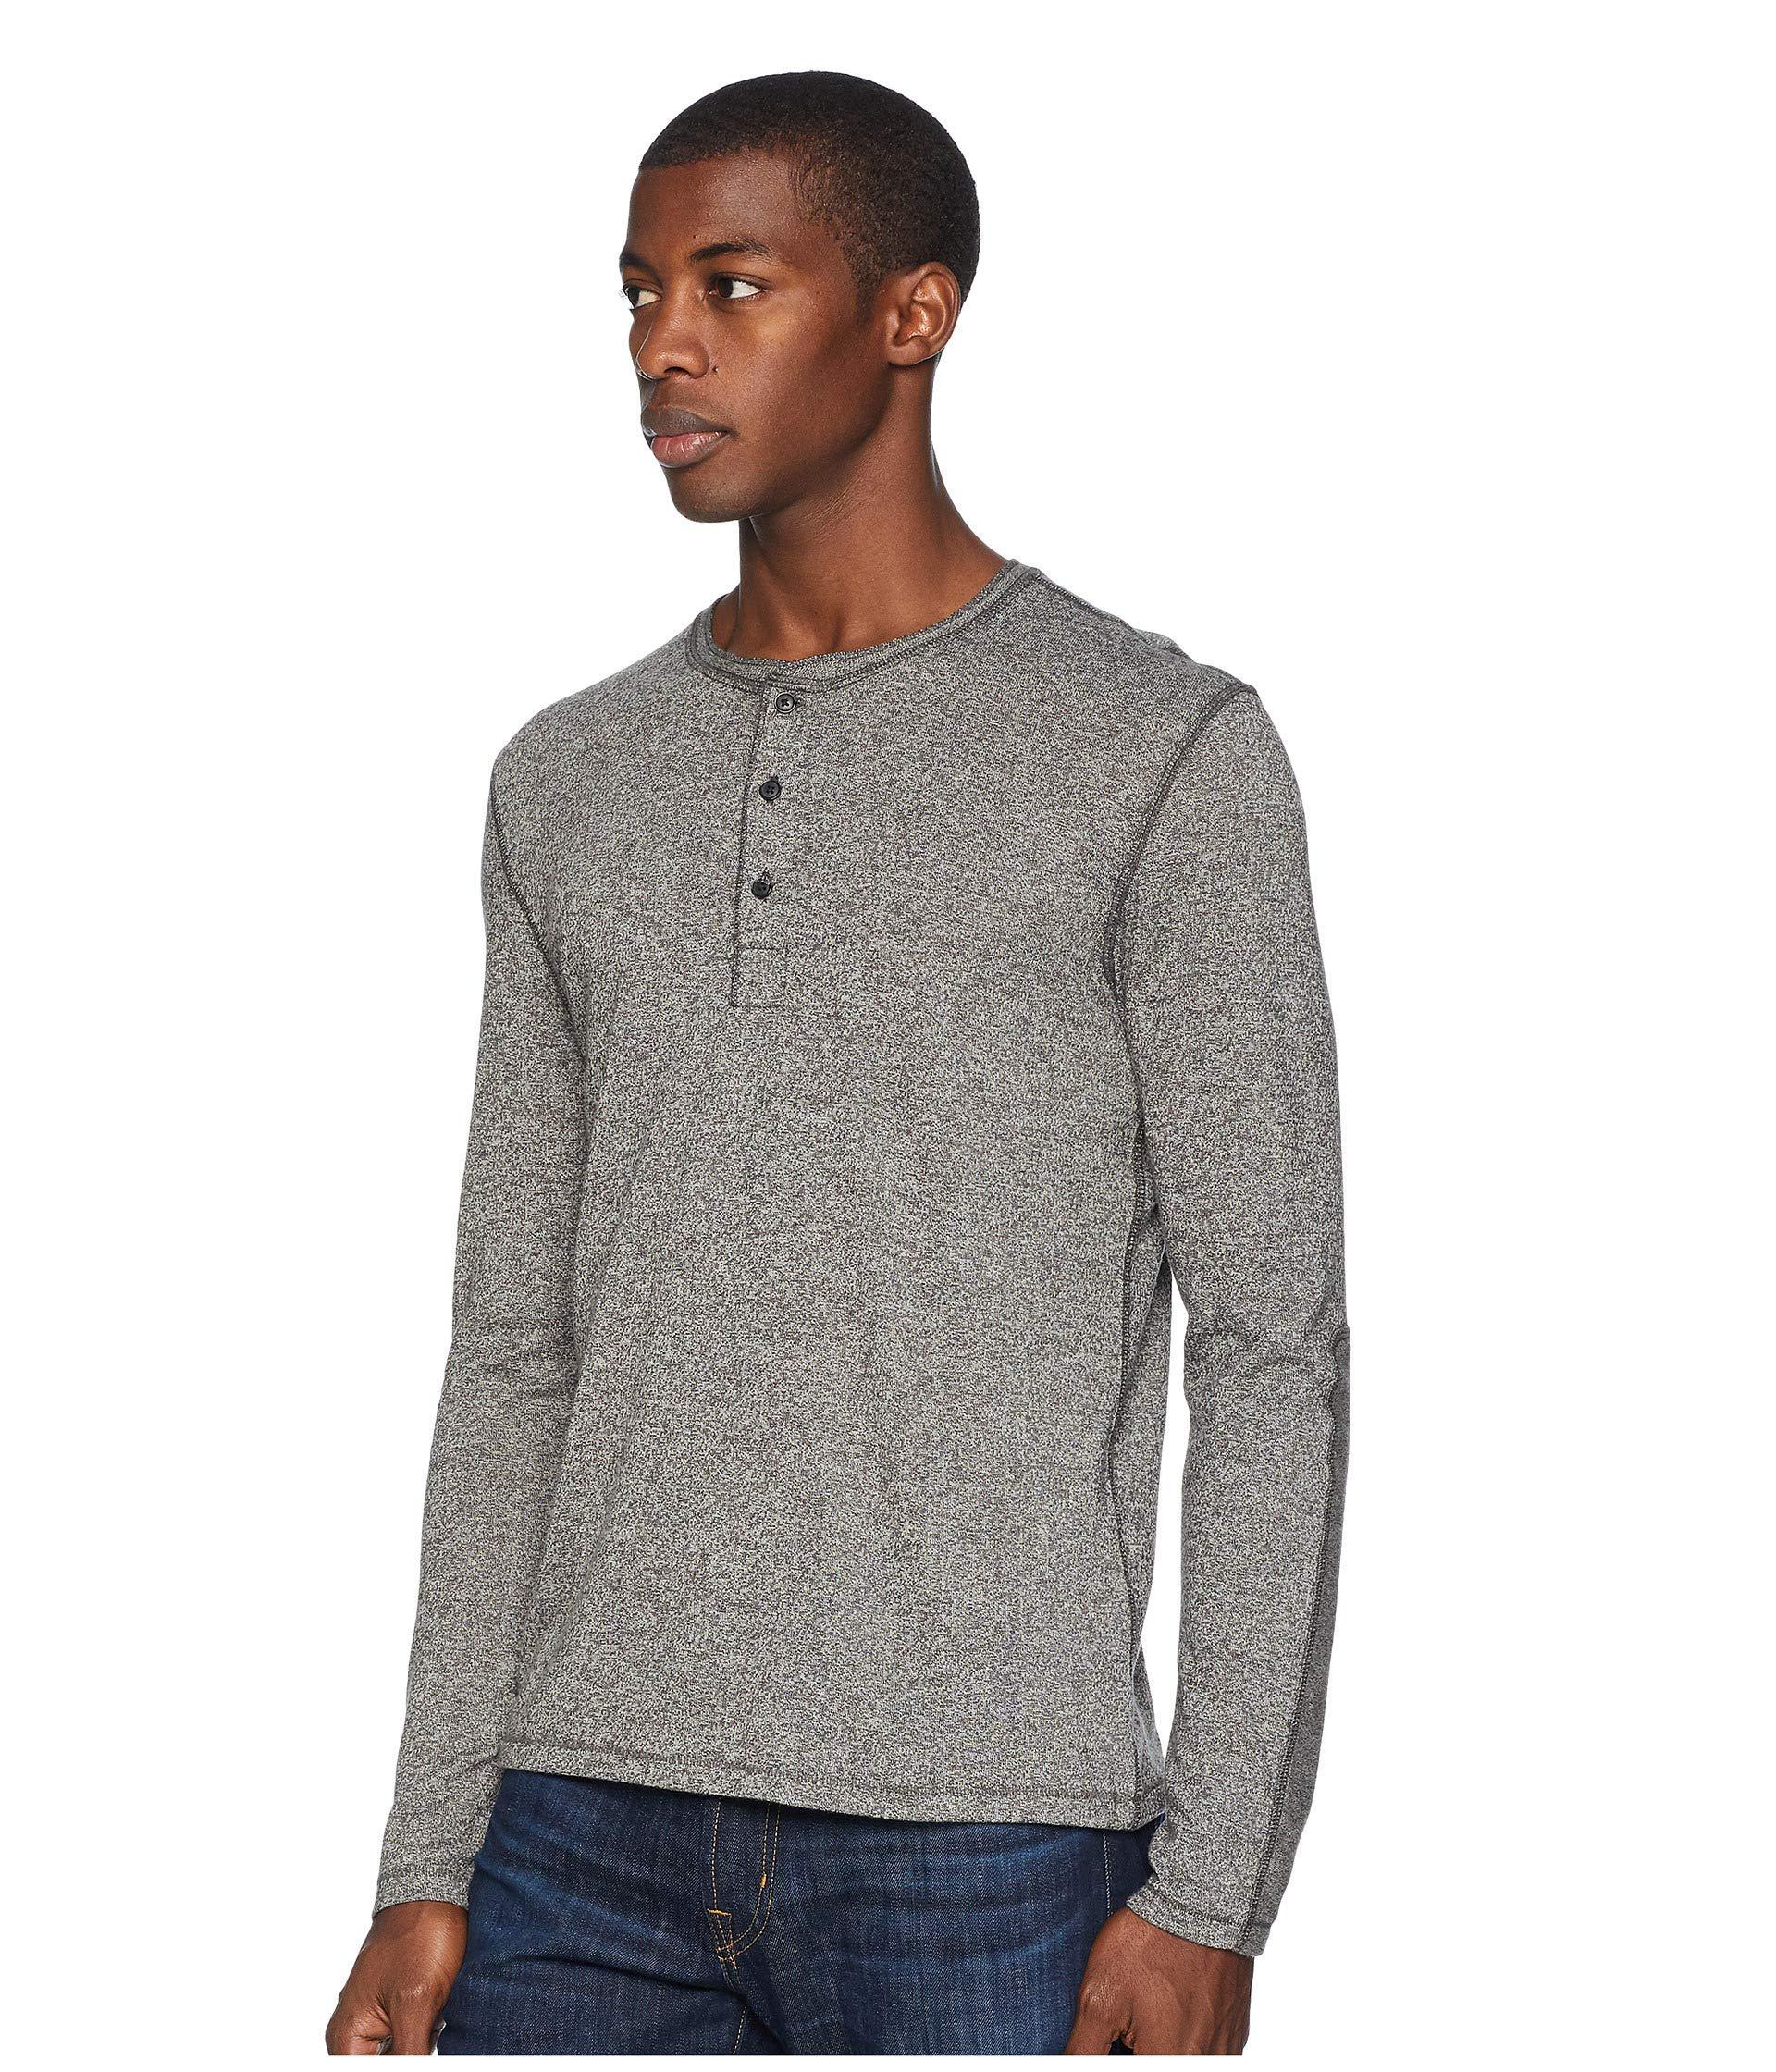 c536af6bd55 Lyst billy reid mouline henley grey mens clothing in gray for men save jpg  1920x2240 Grey